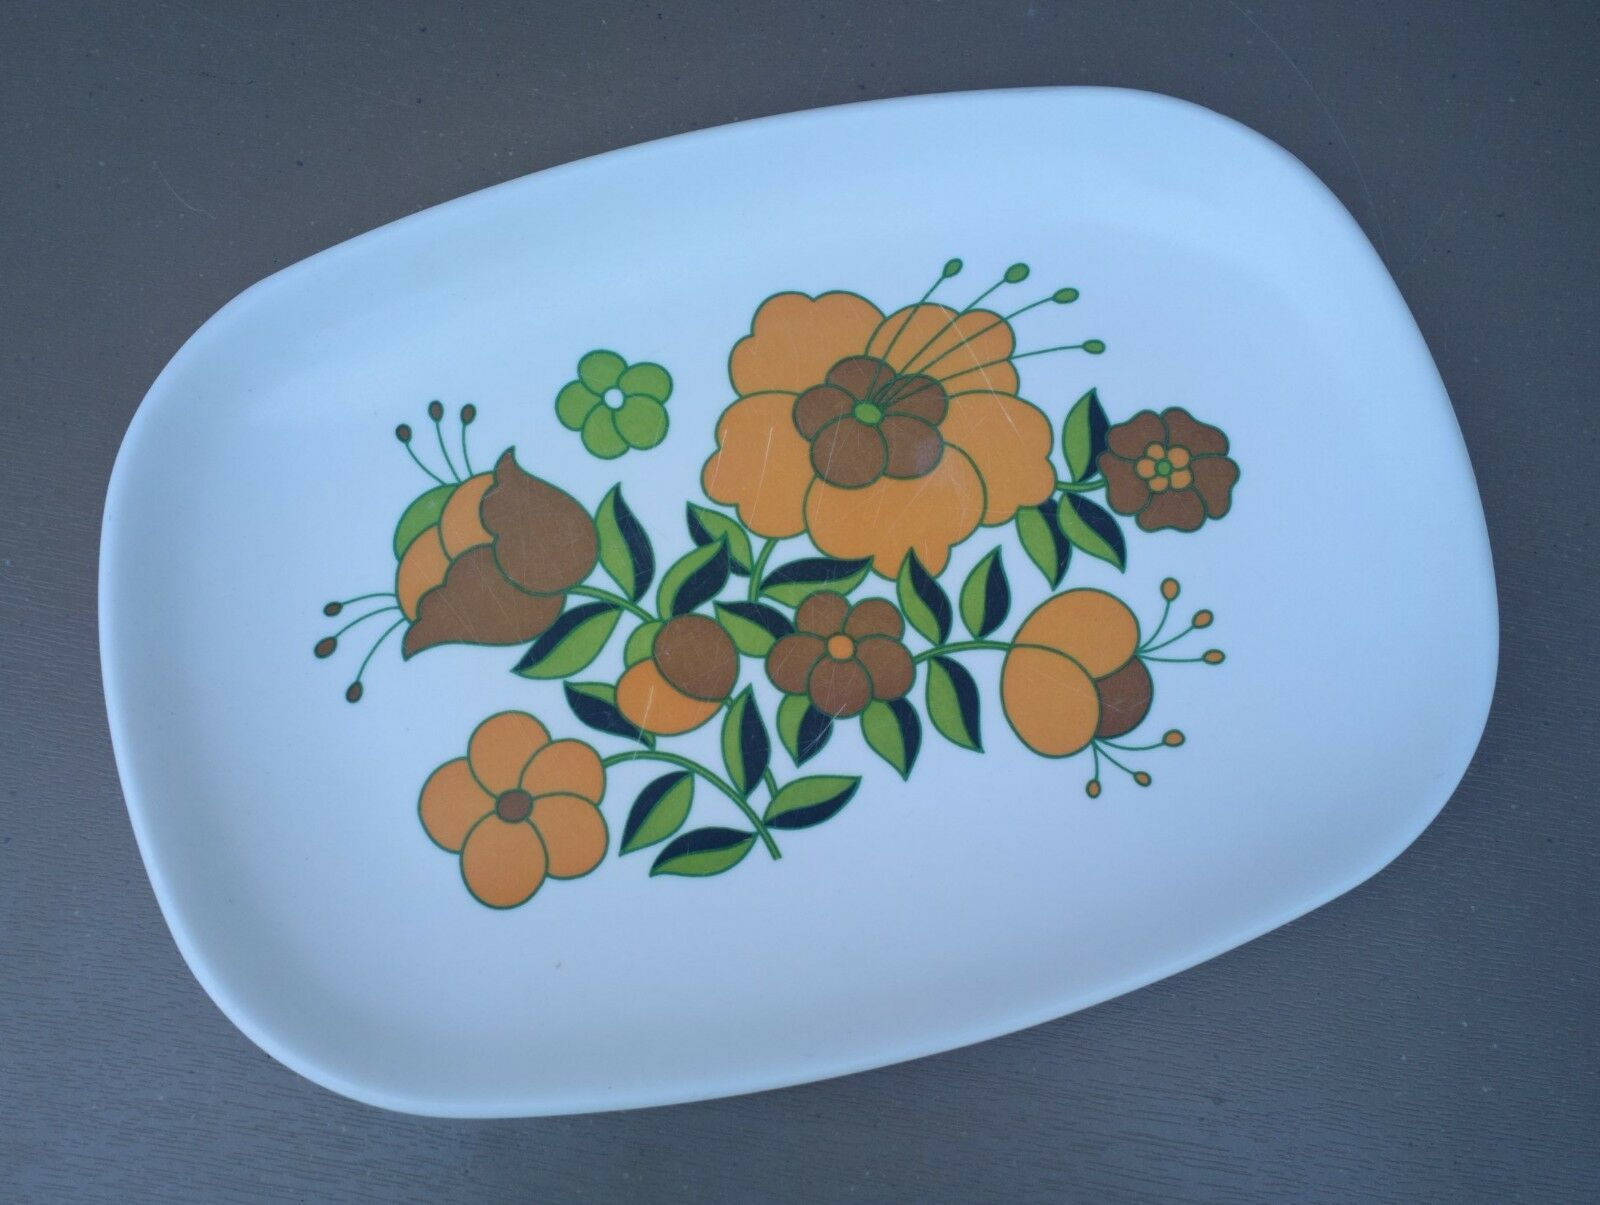 Plat rectangulaire mélamine vintage TEFAL vaisselle camping camping camping FLEUR orange vert #1 593ac0